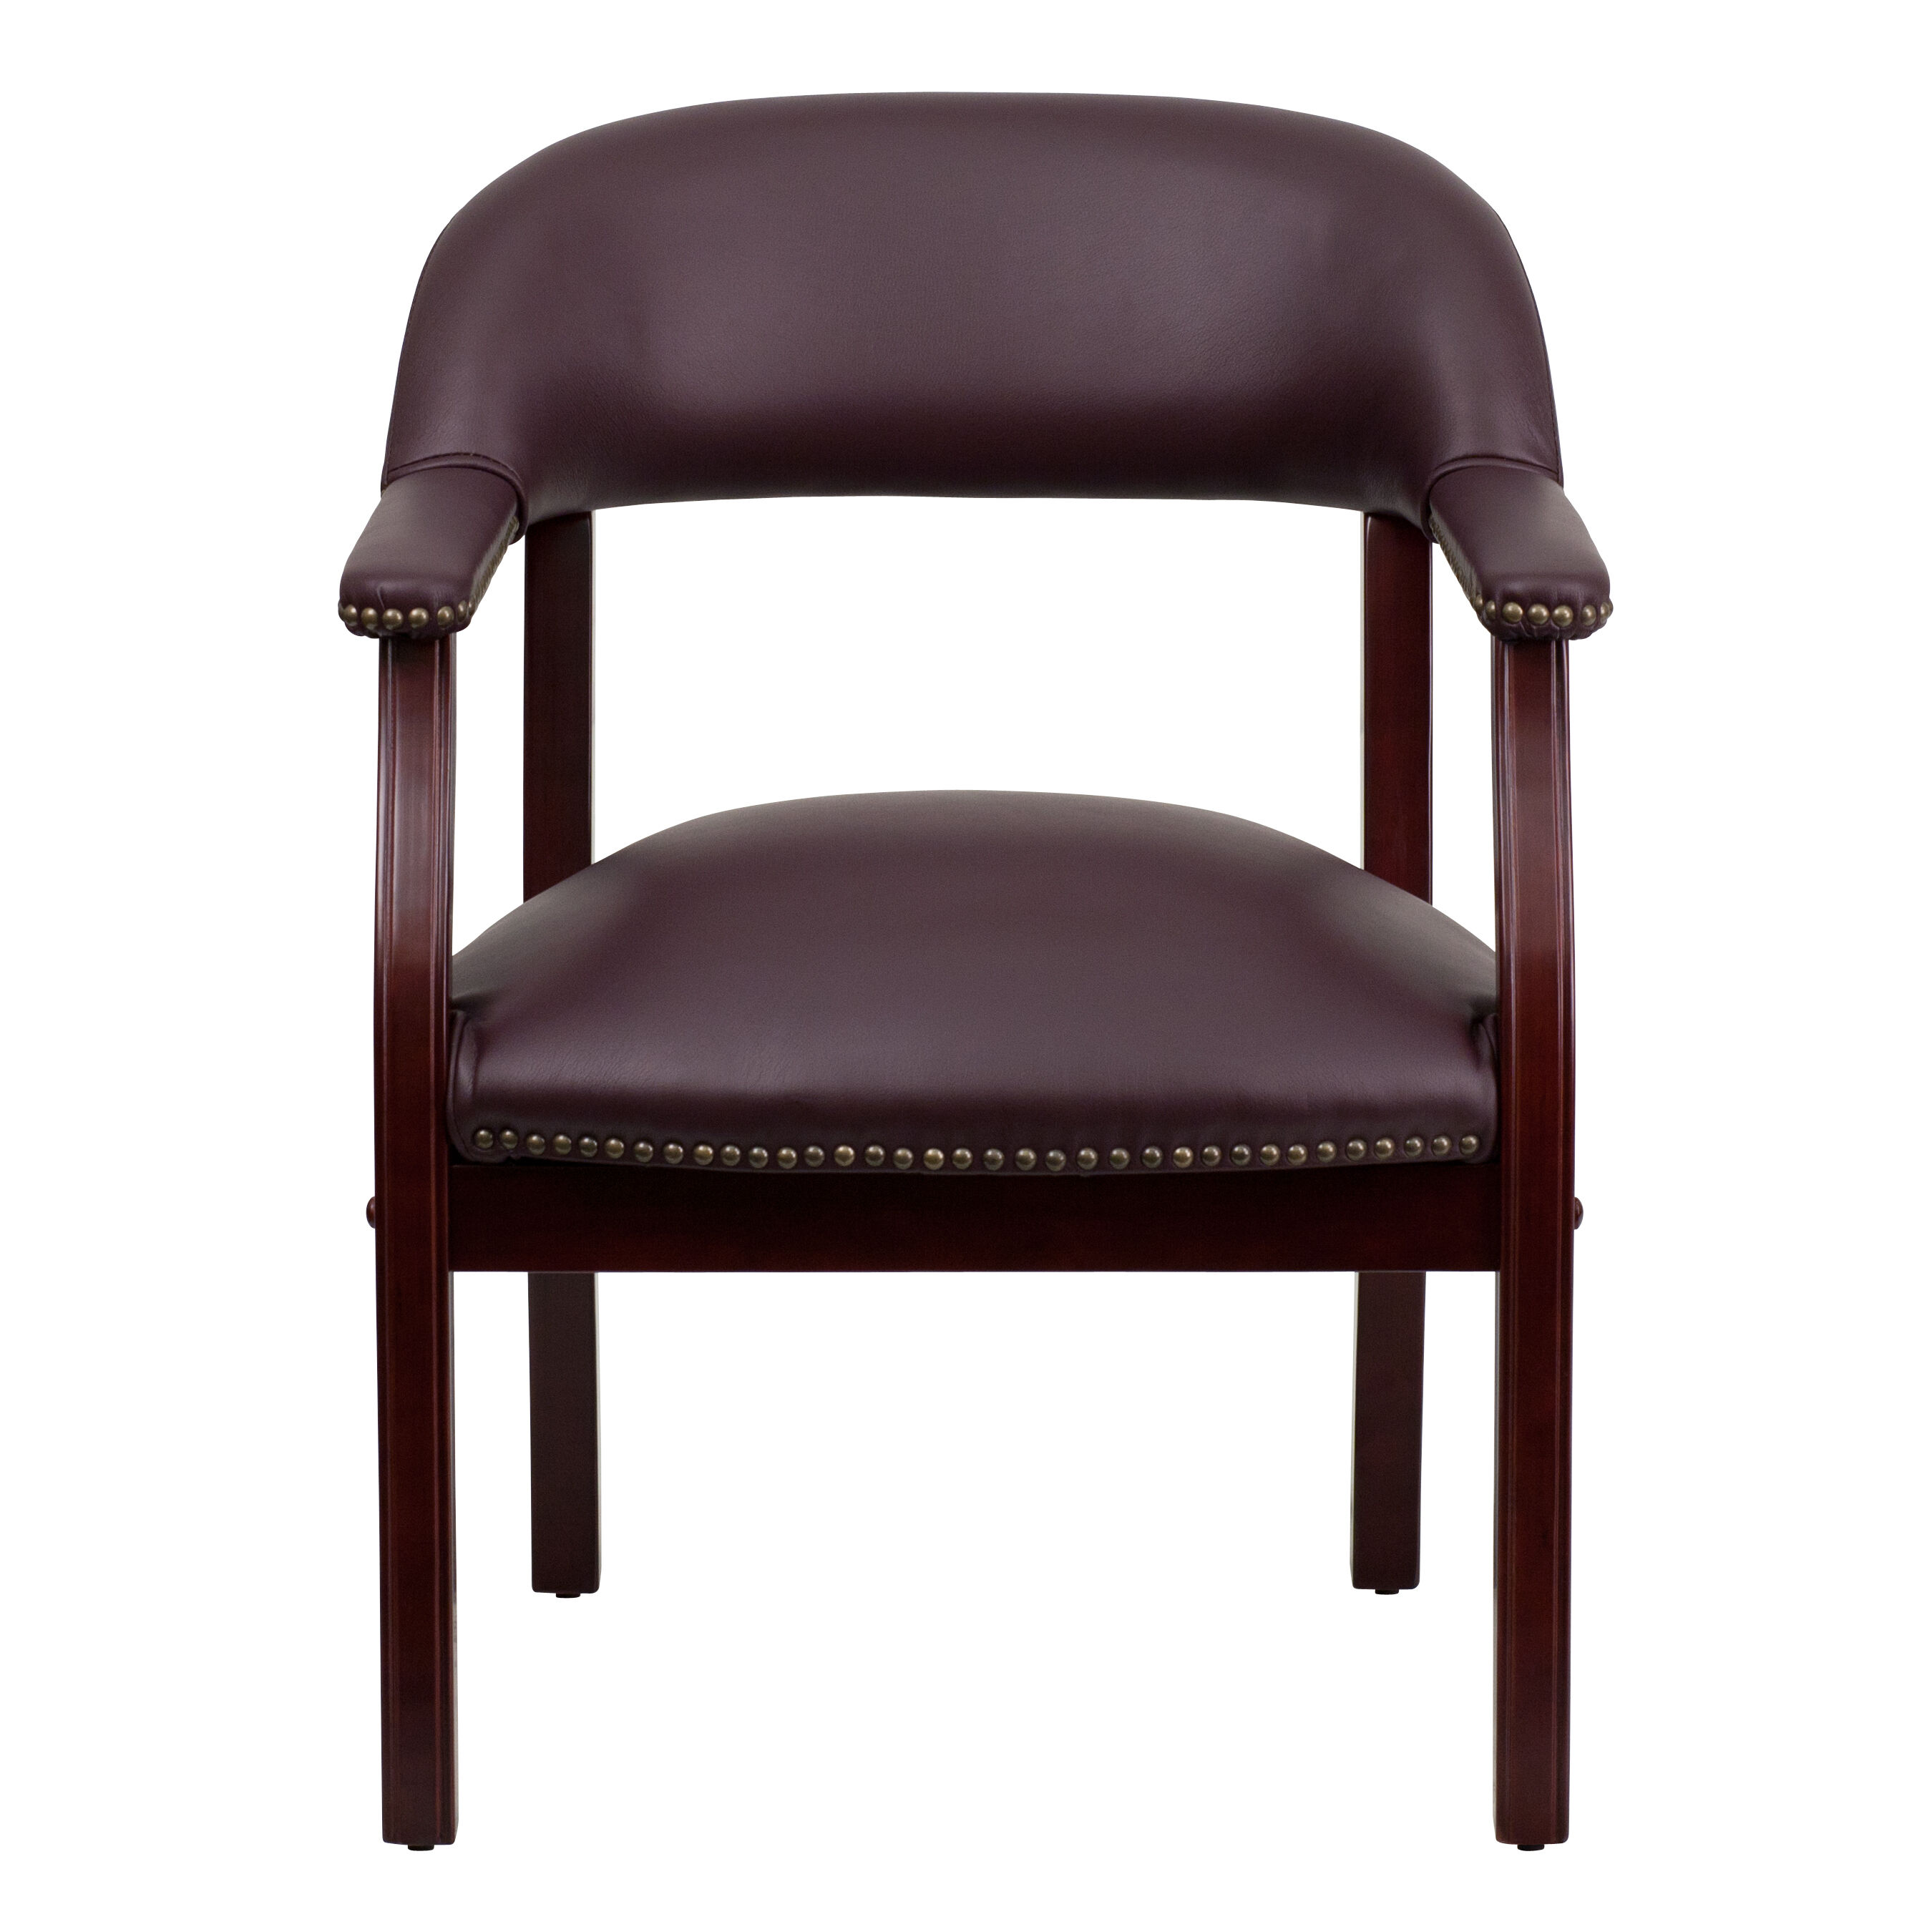 burgundy leather guest chair b z105 lf19 lea gg bizchair com